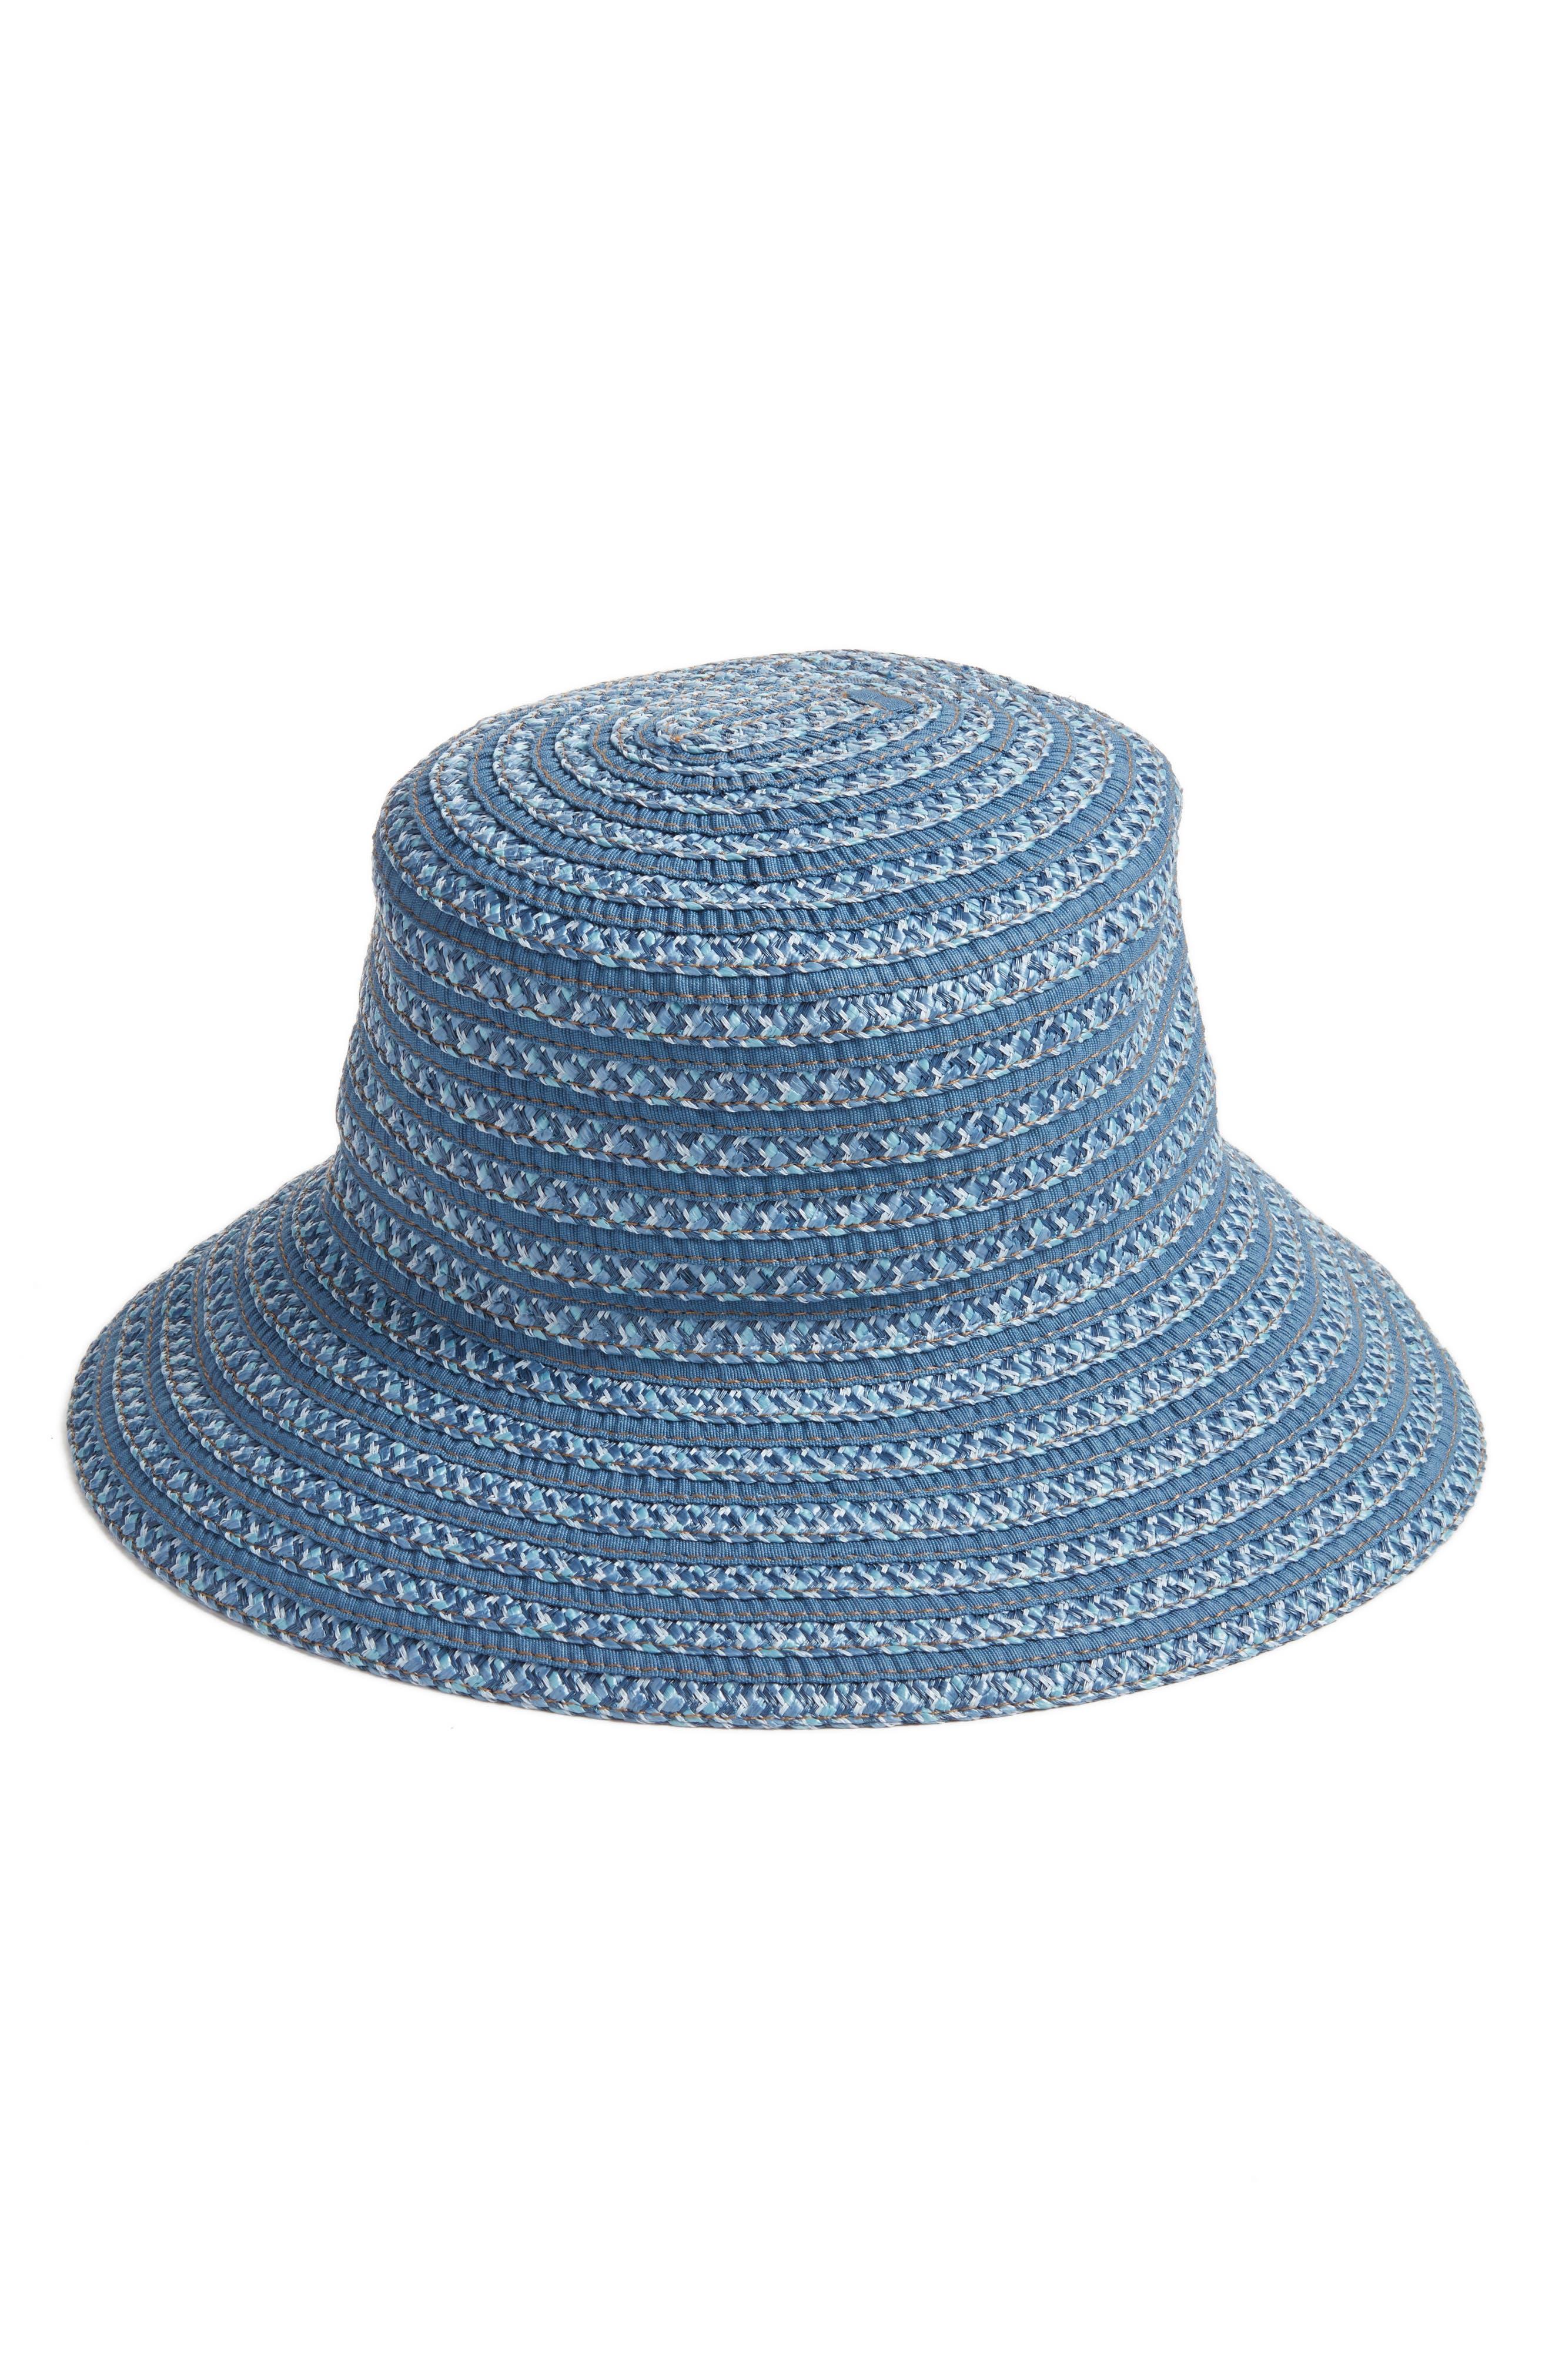 Main Image - Eric Javits 'Braid Dame' Hat